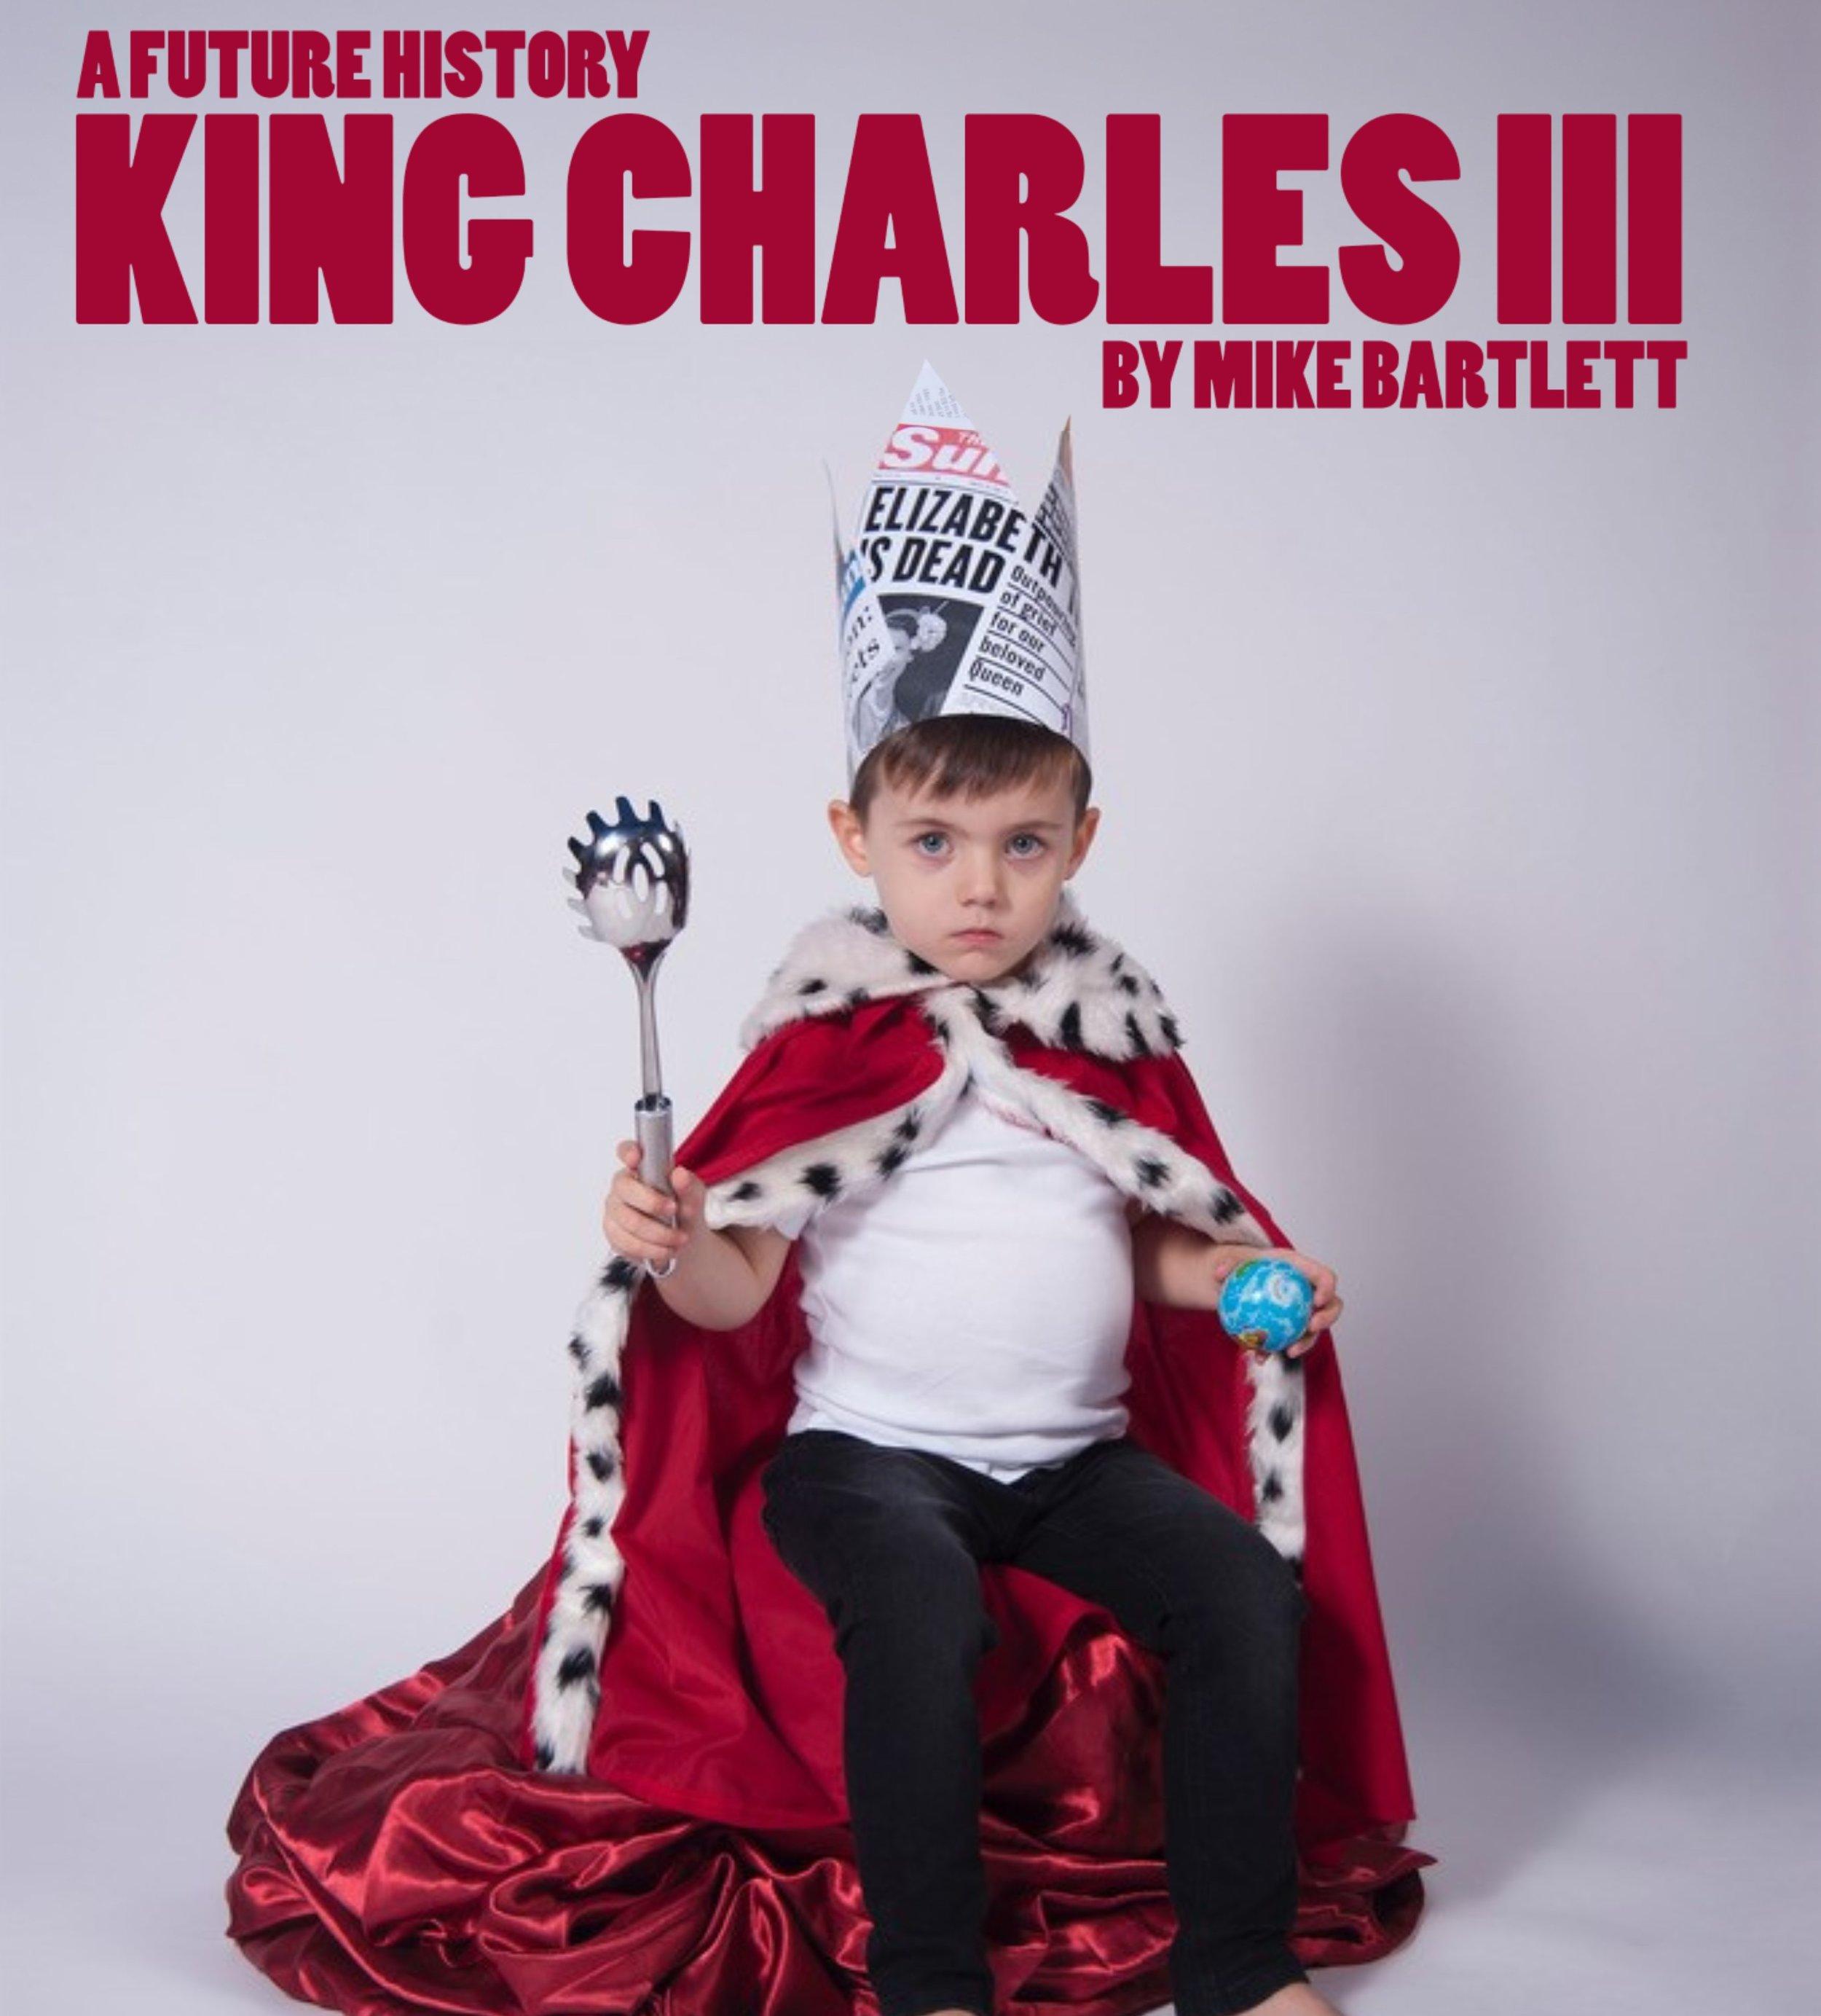 King Charles III web image.jpg